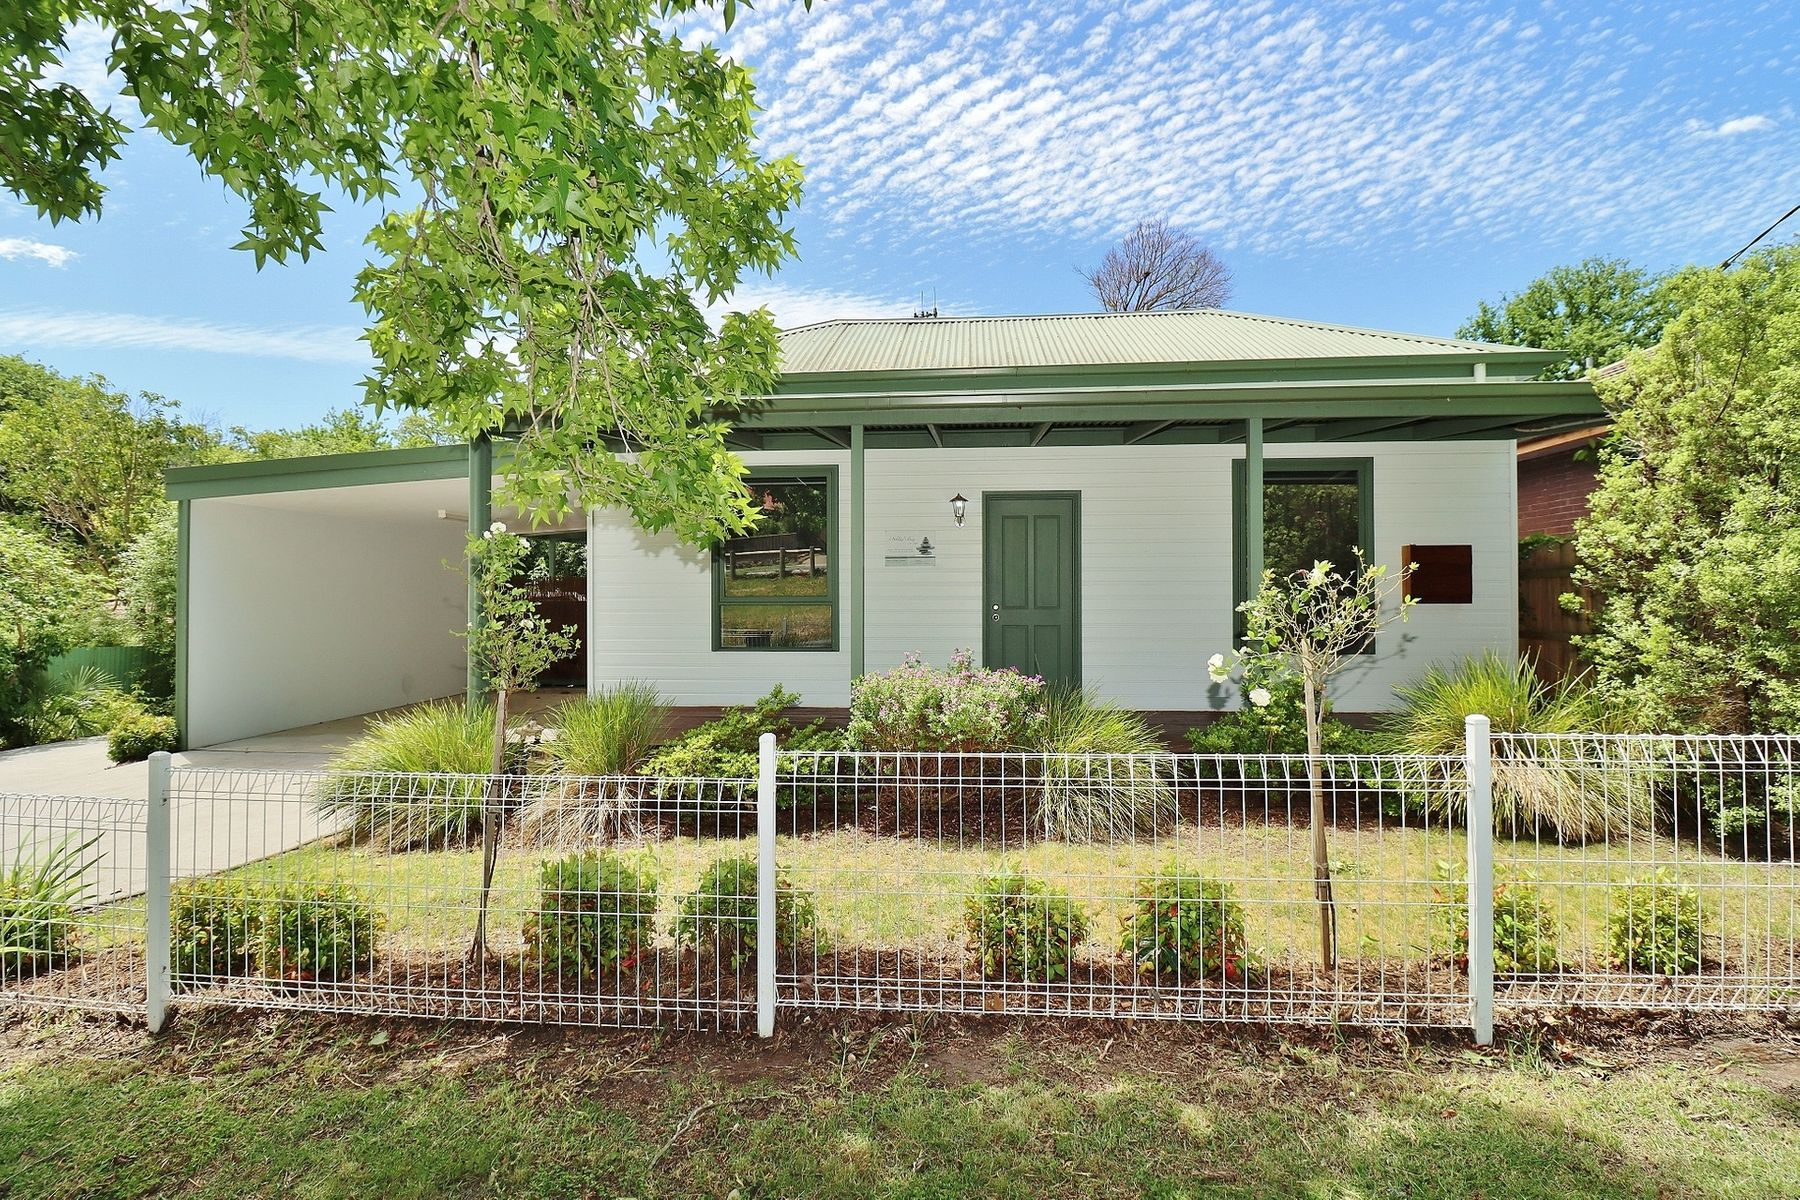 6 Green Street, Healesville, VIC 3777